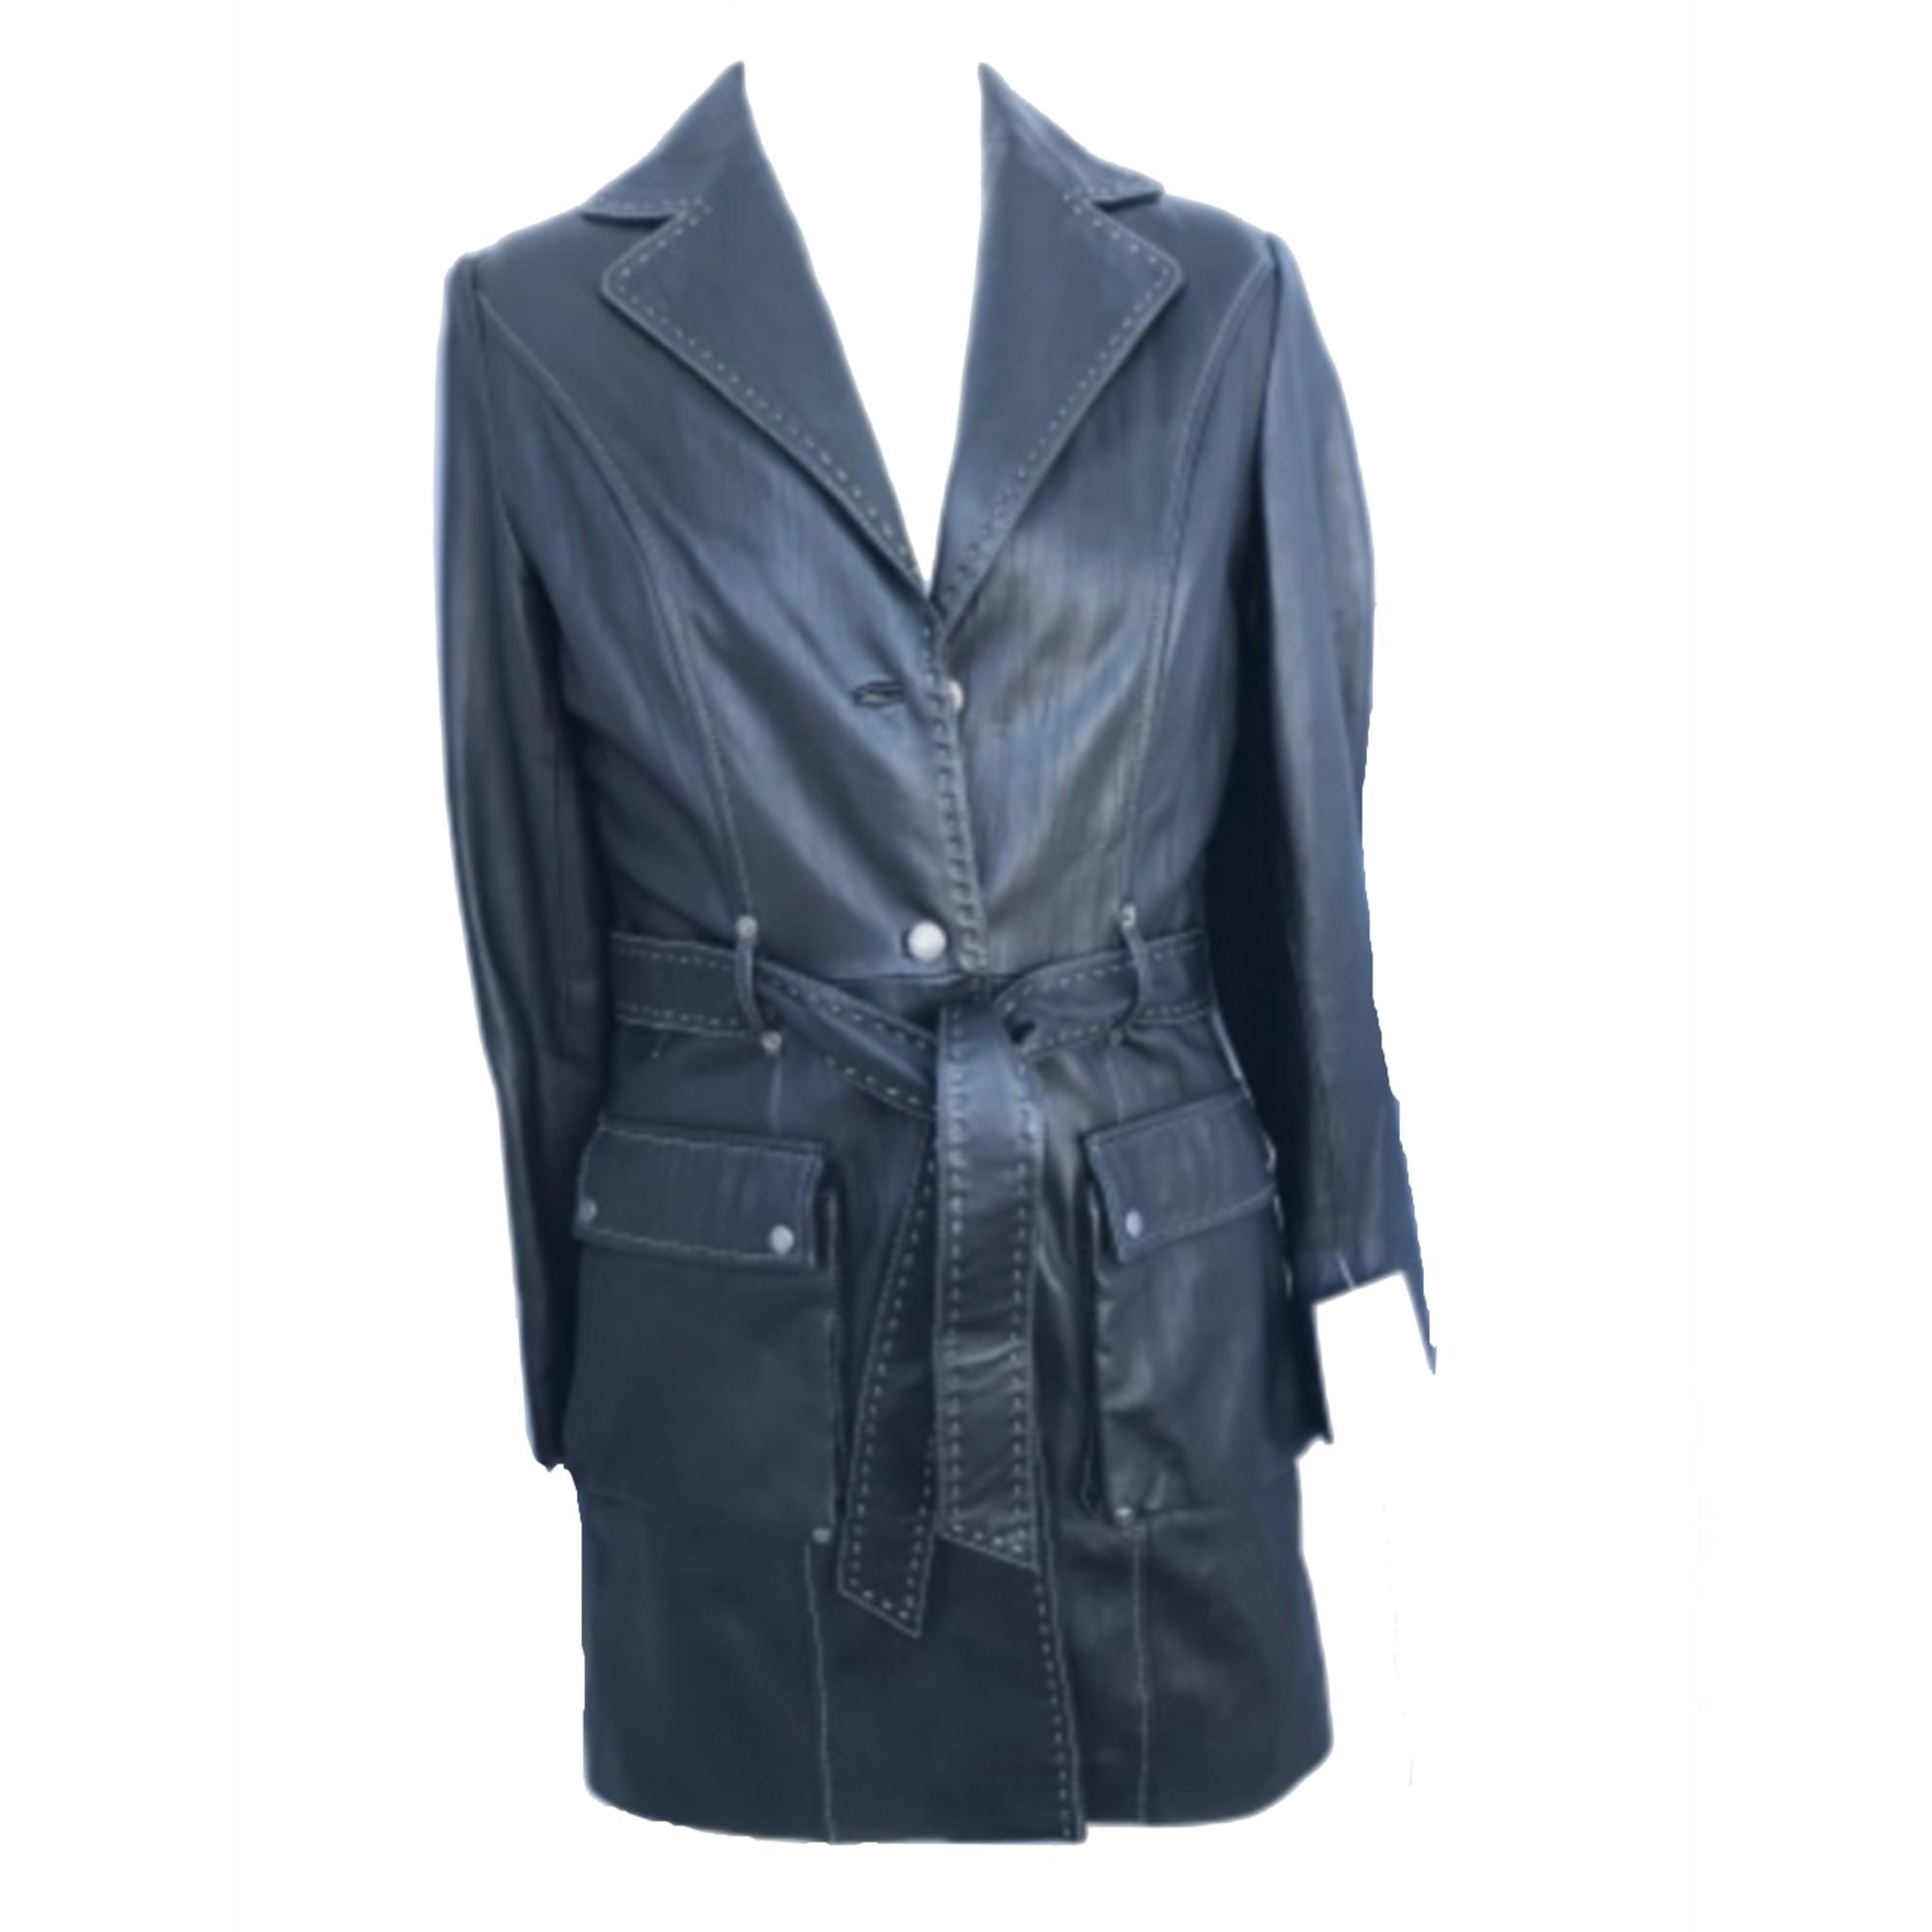 Manteau en cuir GIOVANNI Noir